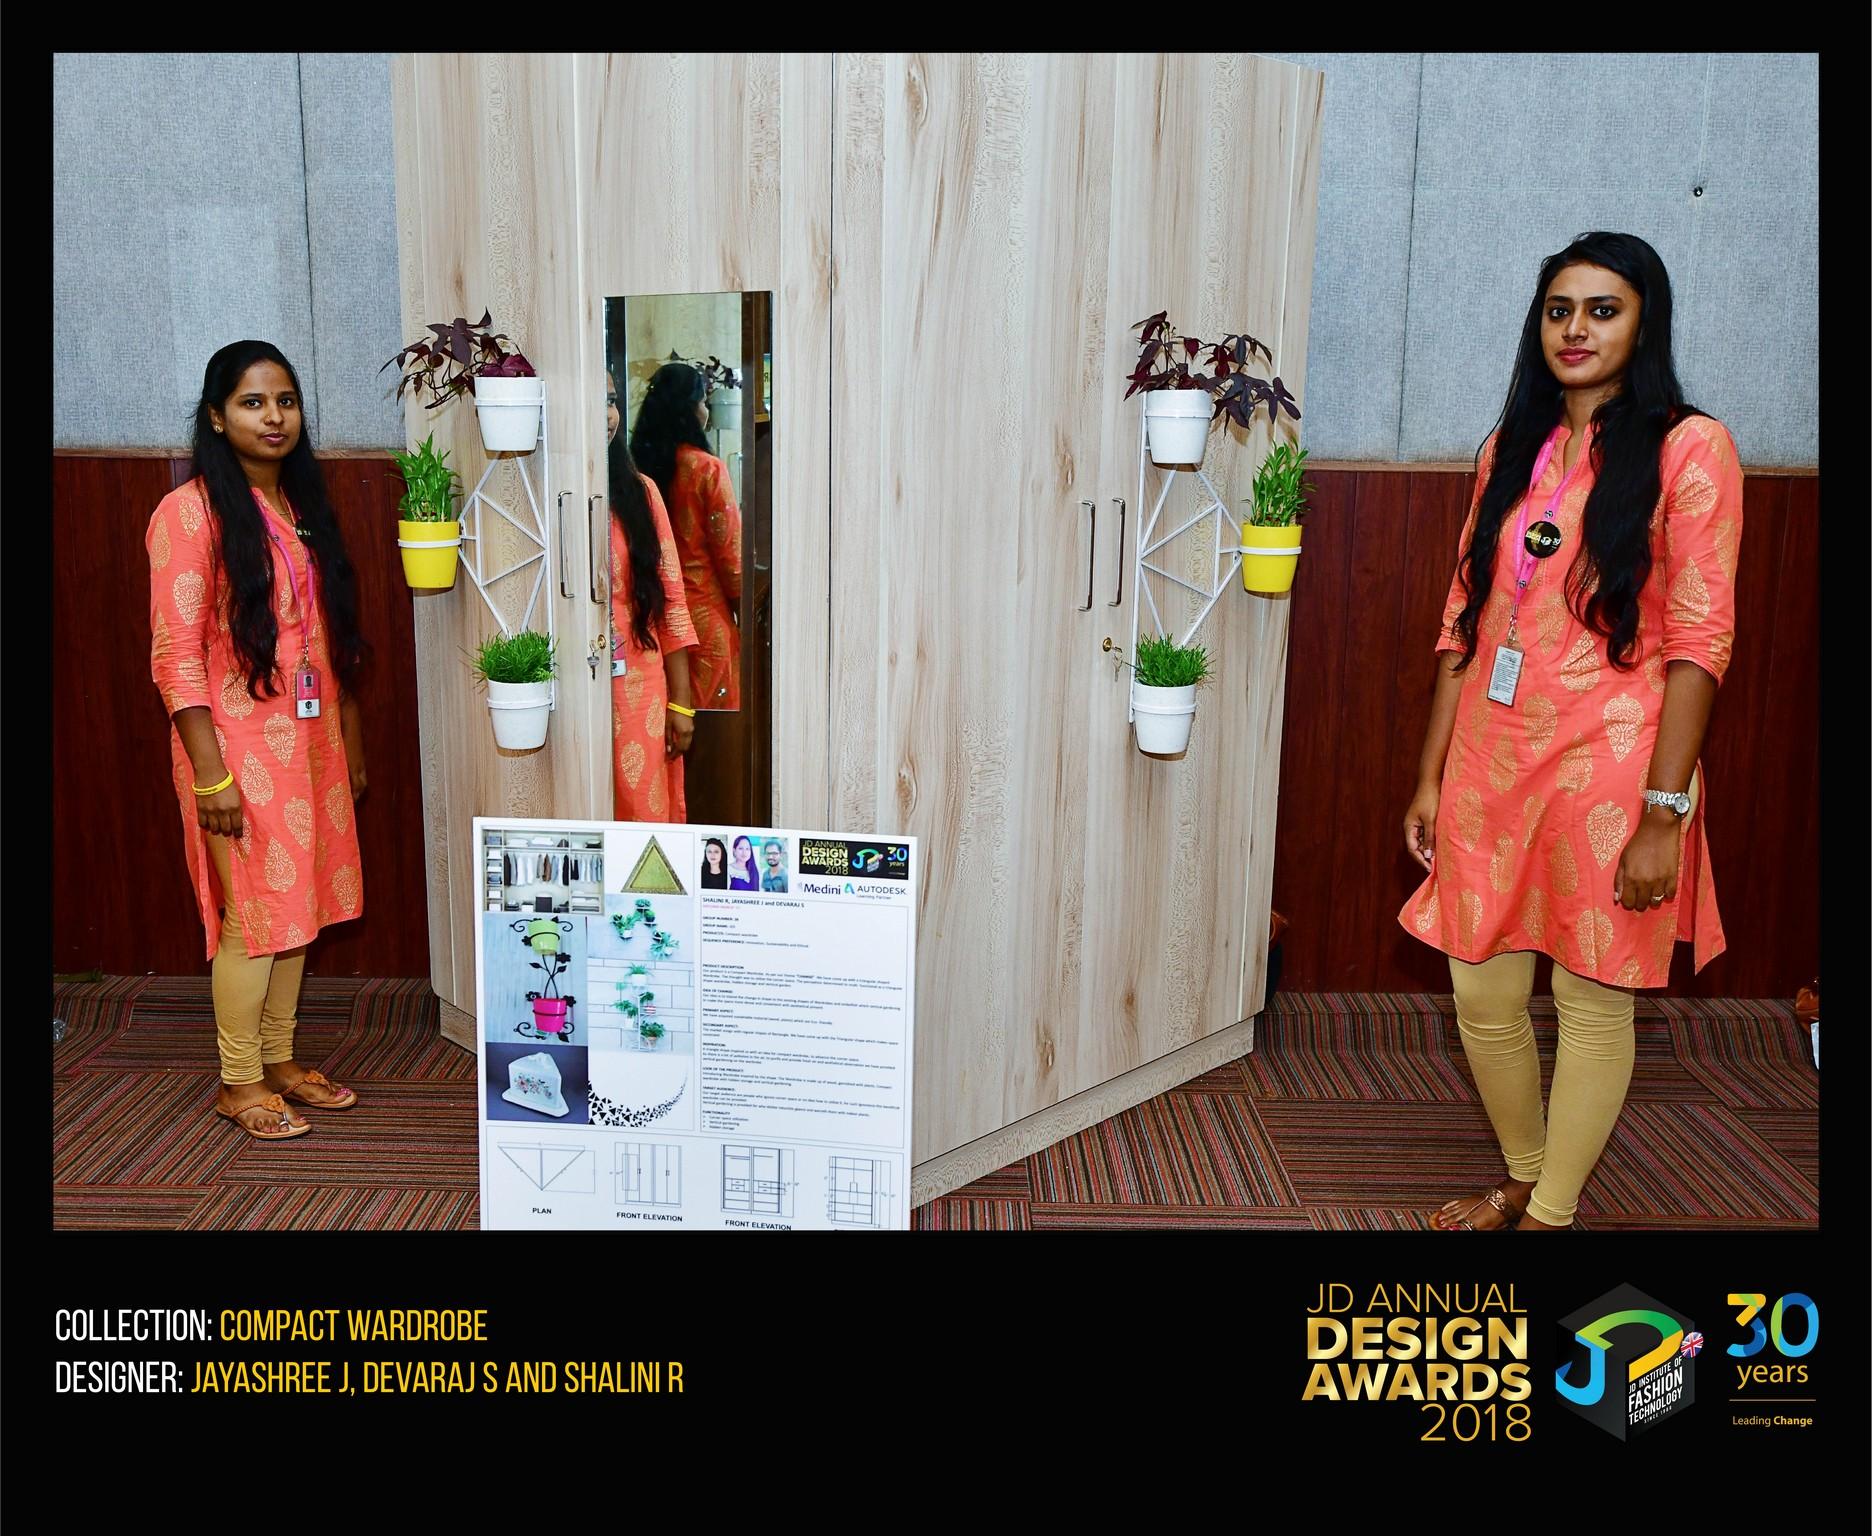 compact wardrobe - compact wordrobe - Compact wardrobe – Change – JD Annual Design Awards 2018